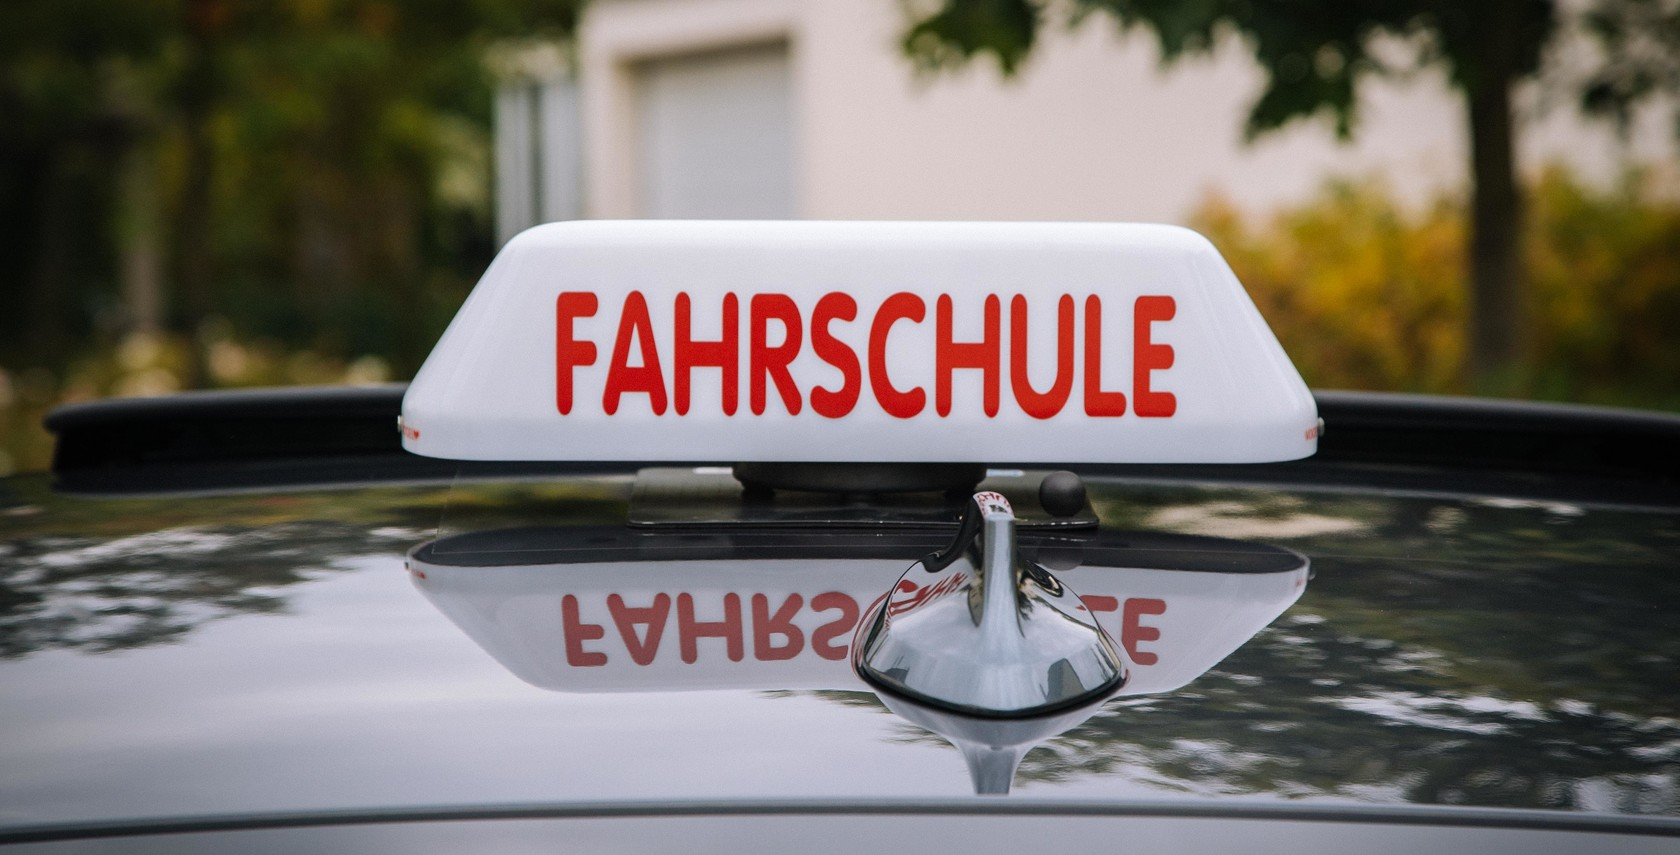 Deine Fahrschule In Oberhausen.